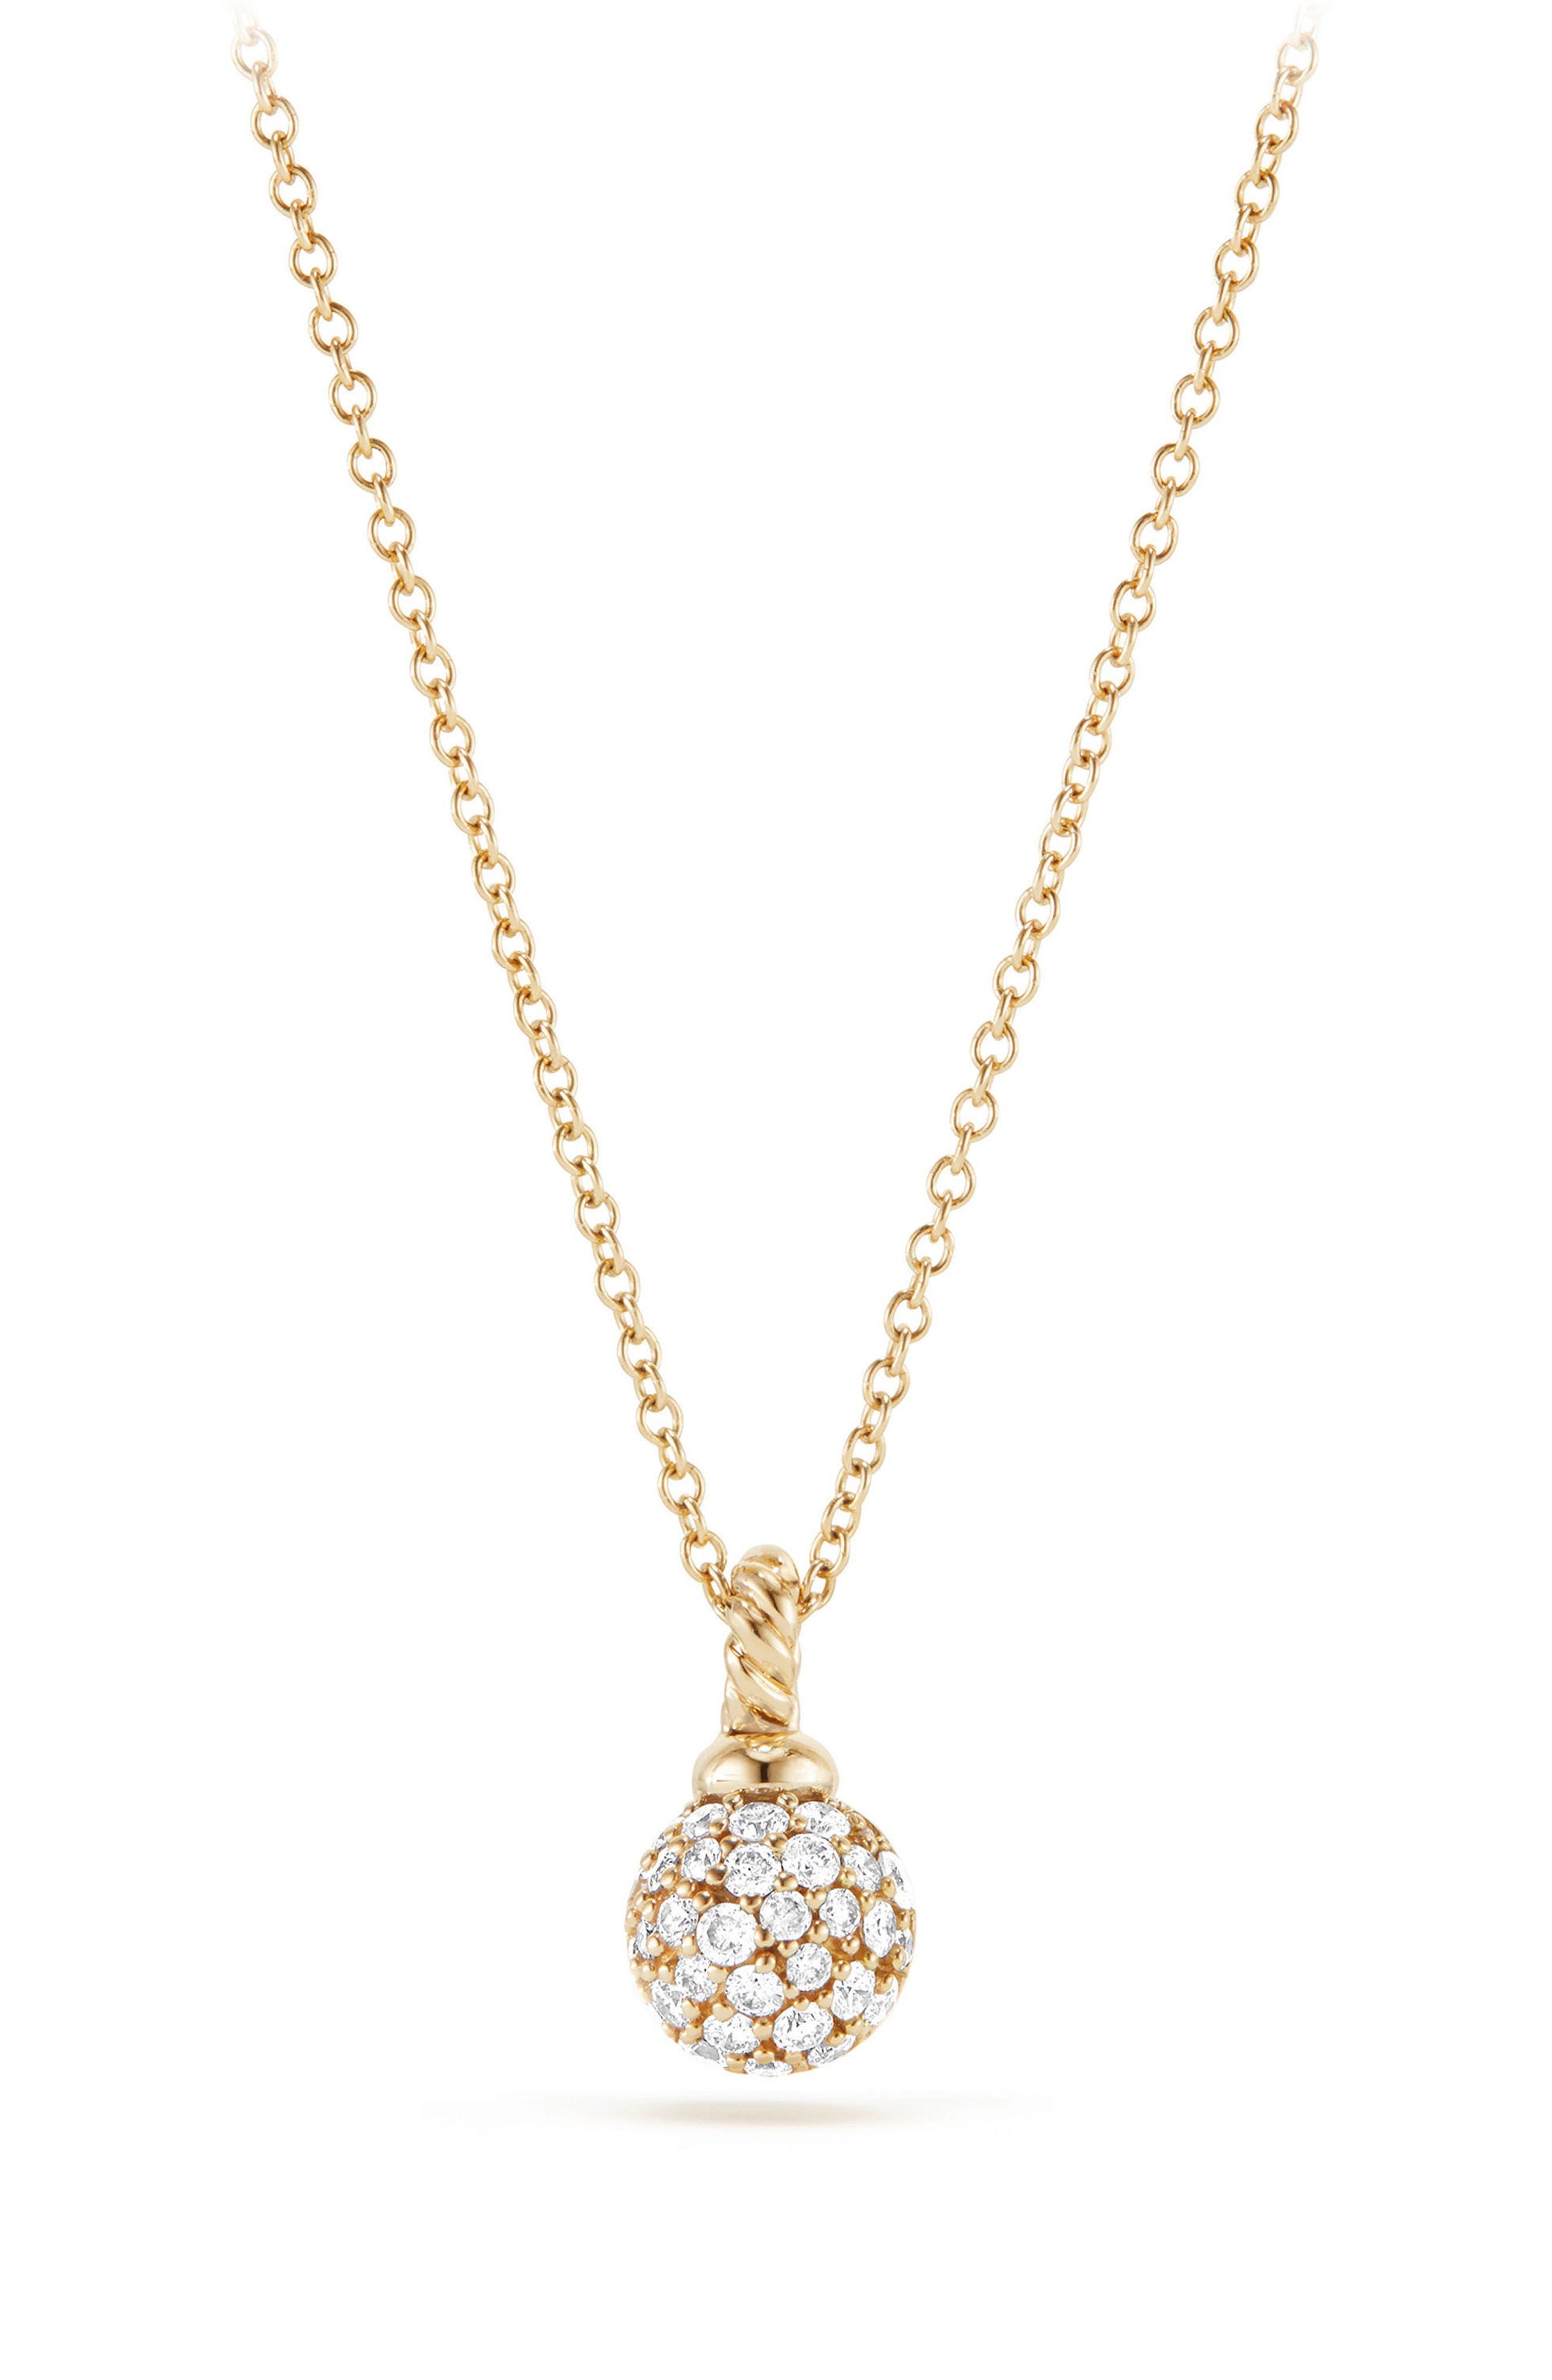 Petite Solari Pavé Necklace with Diamonds in 18K Gold,                             Main thumbnail 1, color,                             Yellow Gold/ Diamond